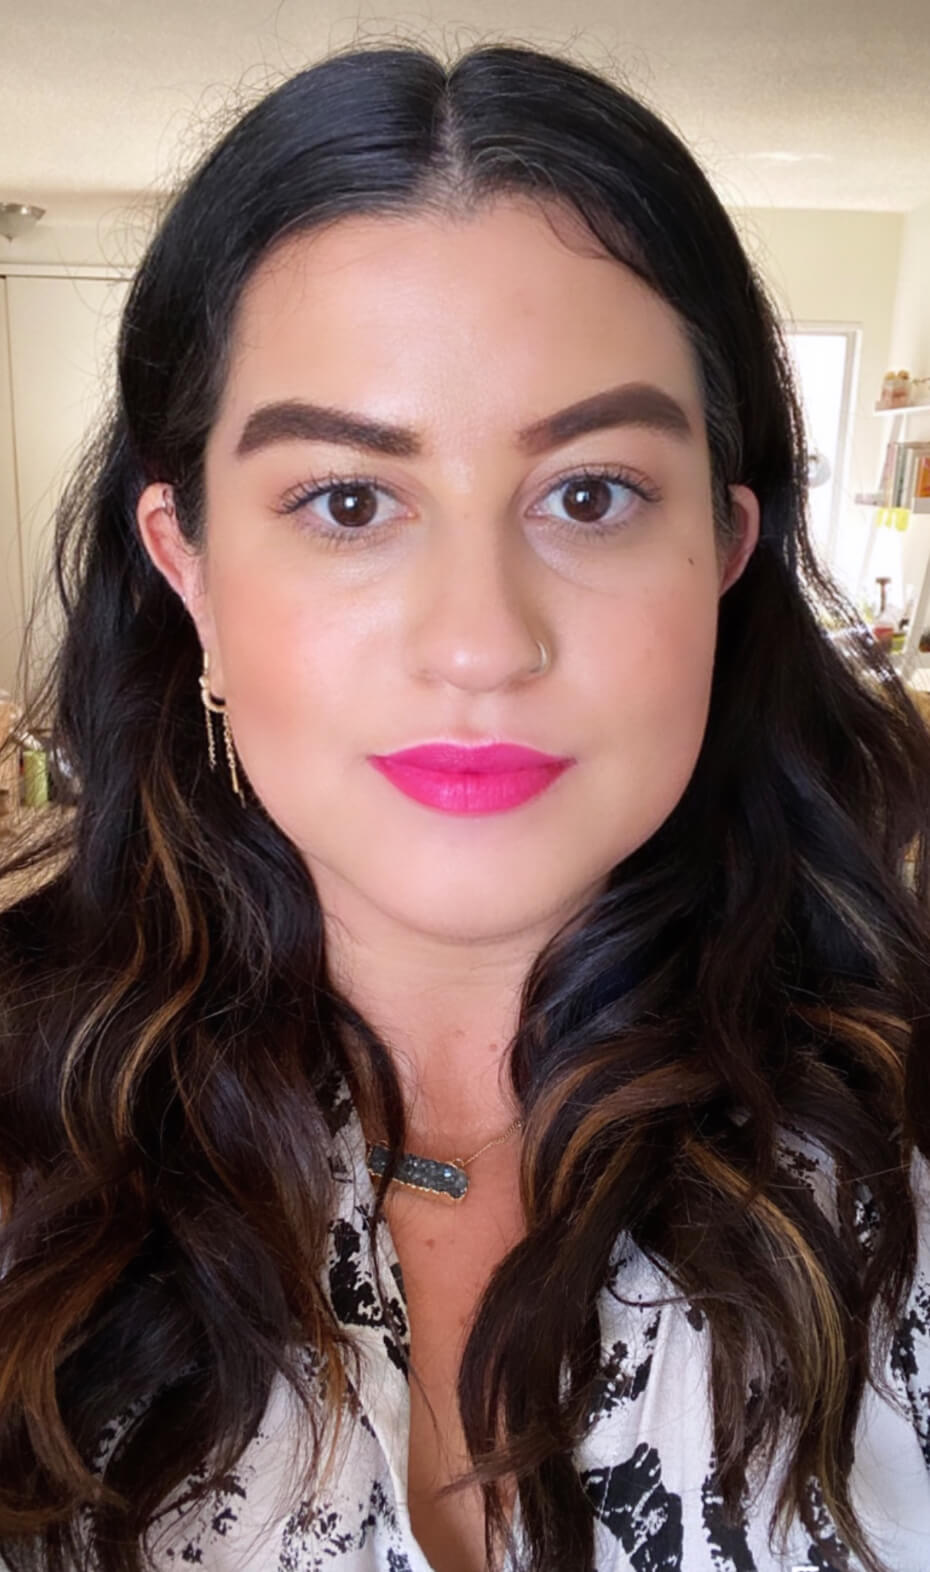 lipstick-huda-beauty-video-star-072920-1